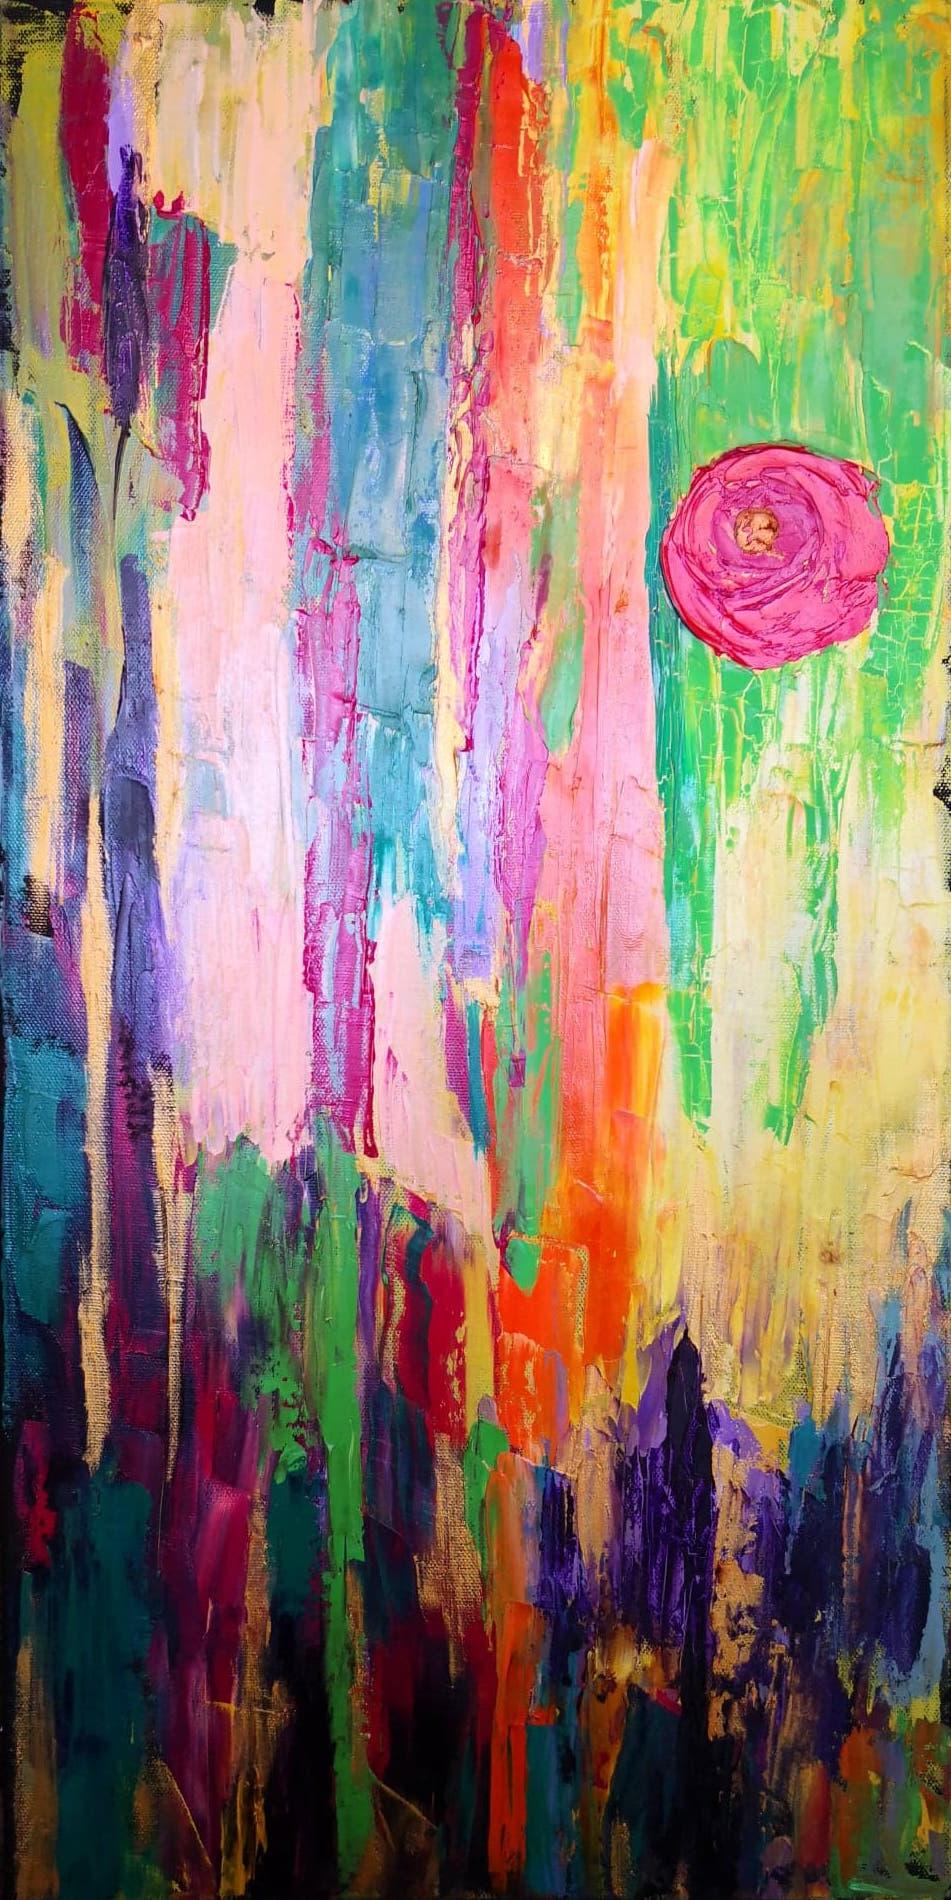 Heather M. Johnson, Aubade Part I (Triptych), Oil on canvas, 24 x 12 inches, $150:panel .jpg